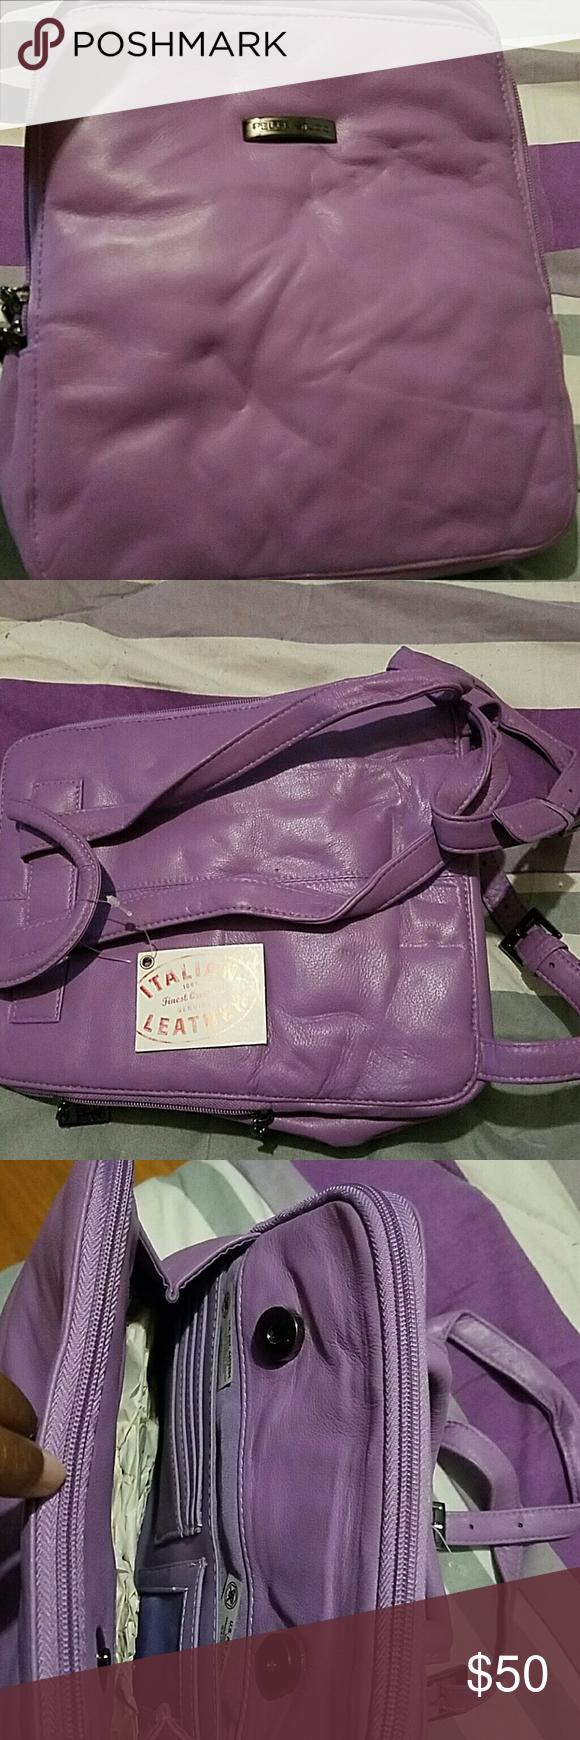 Pelle studios Lavender (wilson leather) backpack NWT